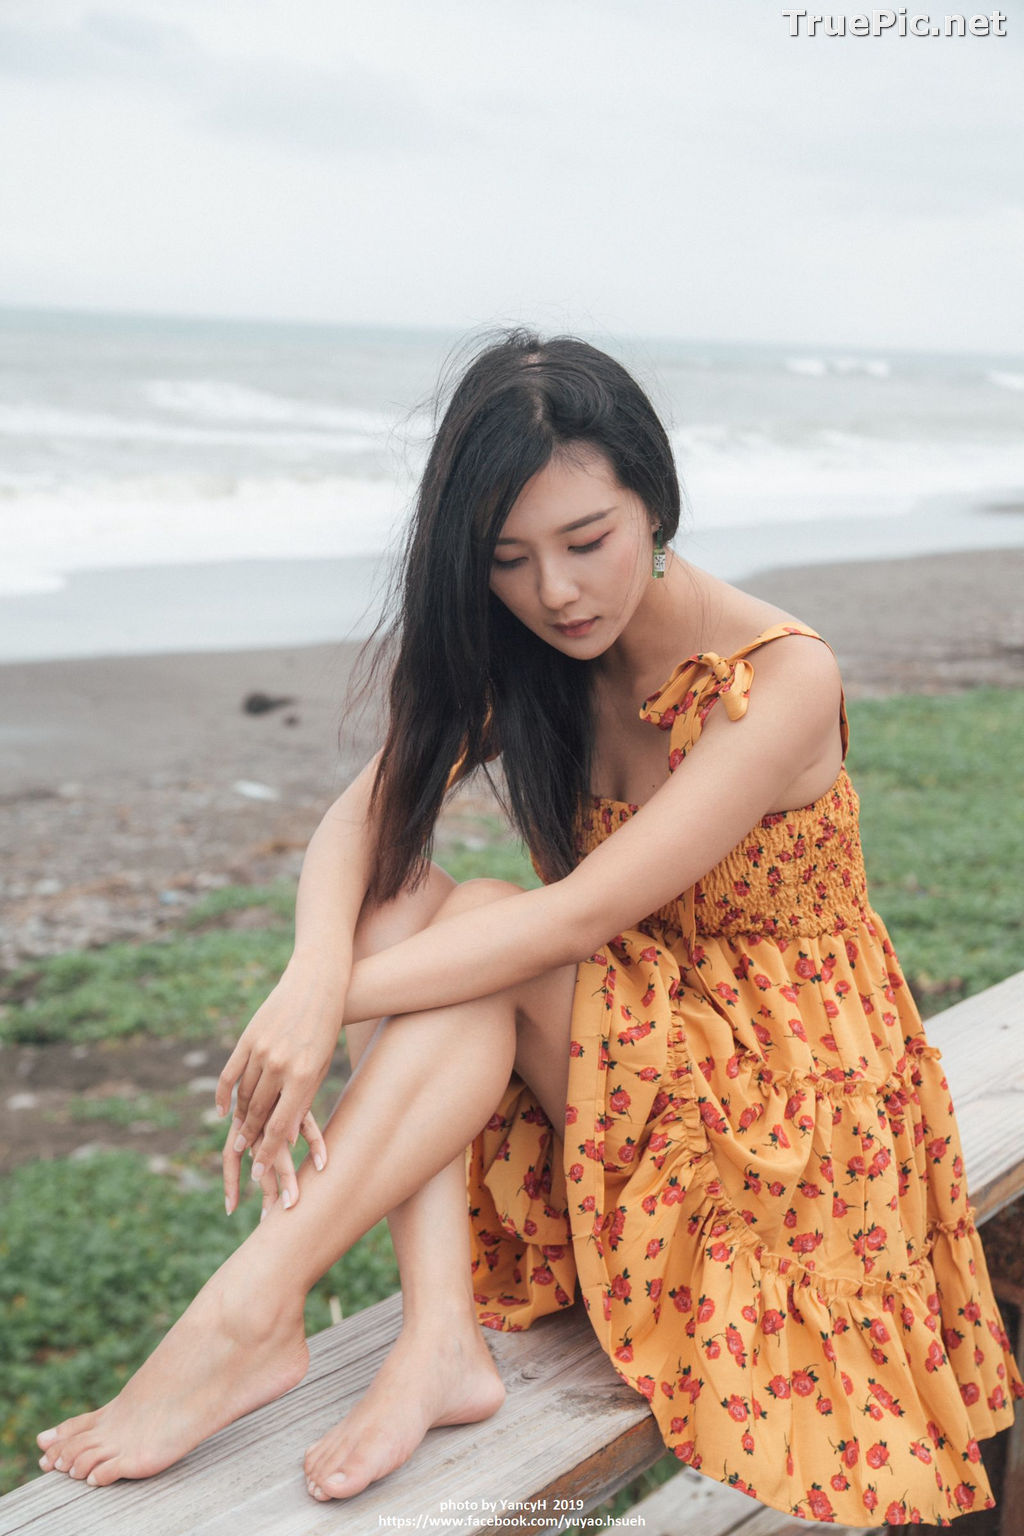 Image Taiwanese Model - 郁晴 - Welcome Summer with Beautiful Bikini Girls - TruePic.net - Picture-9